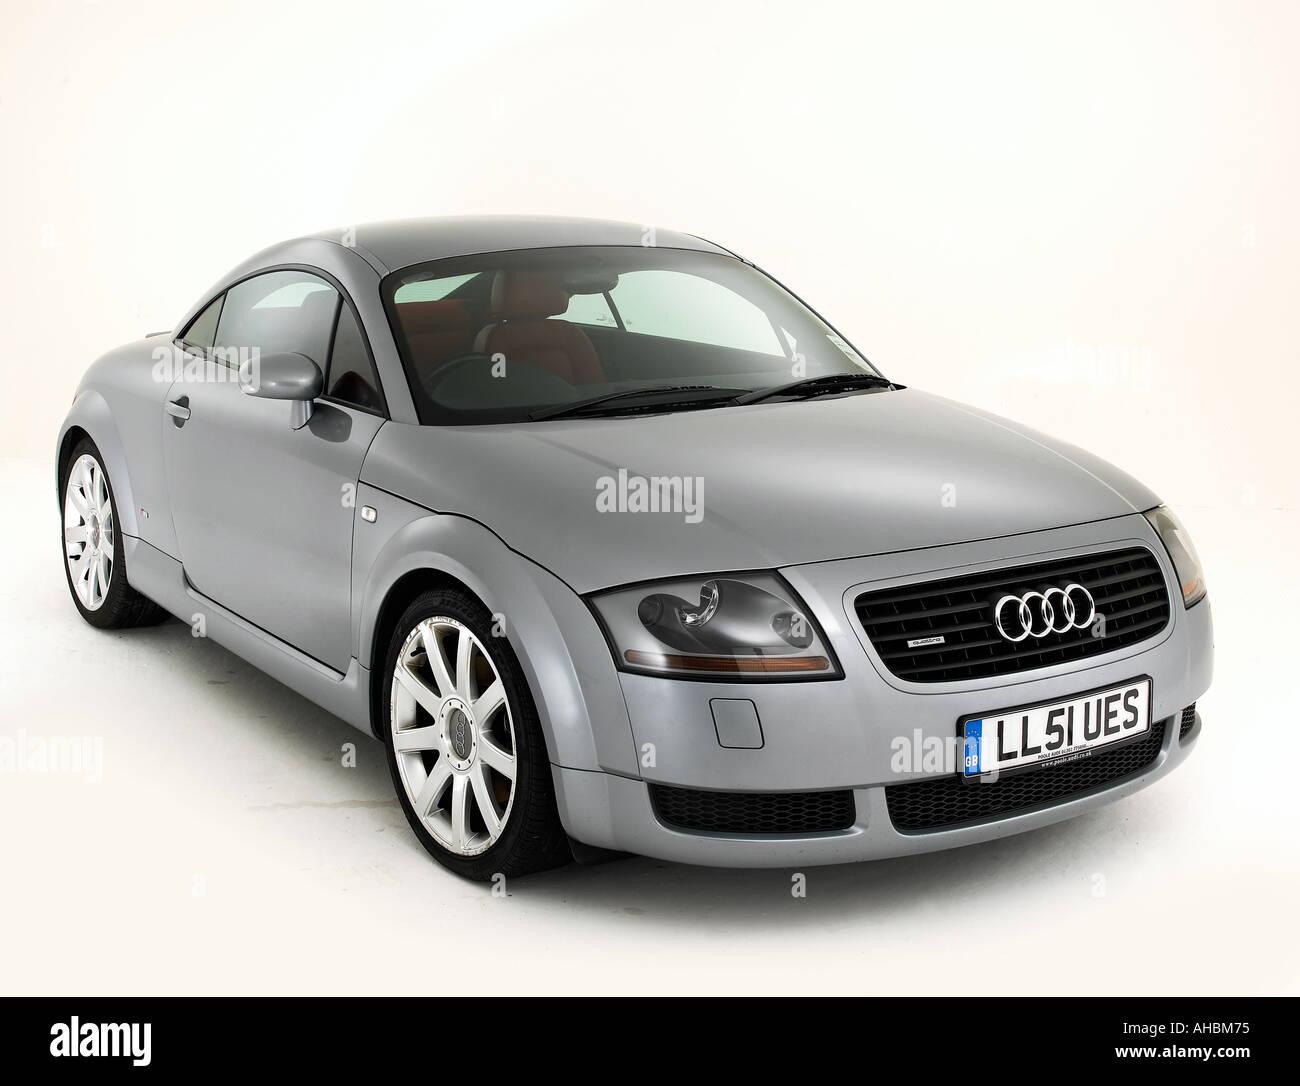 2001 Audi TT Coupe - Stock Image